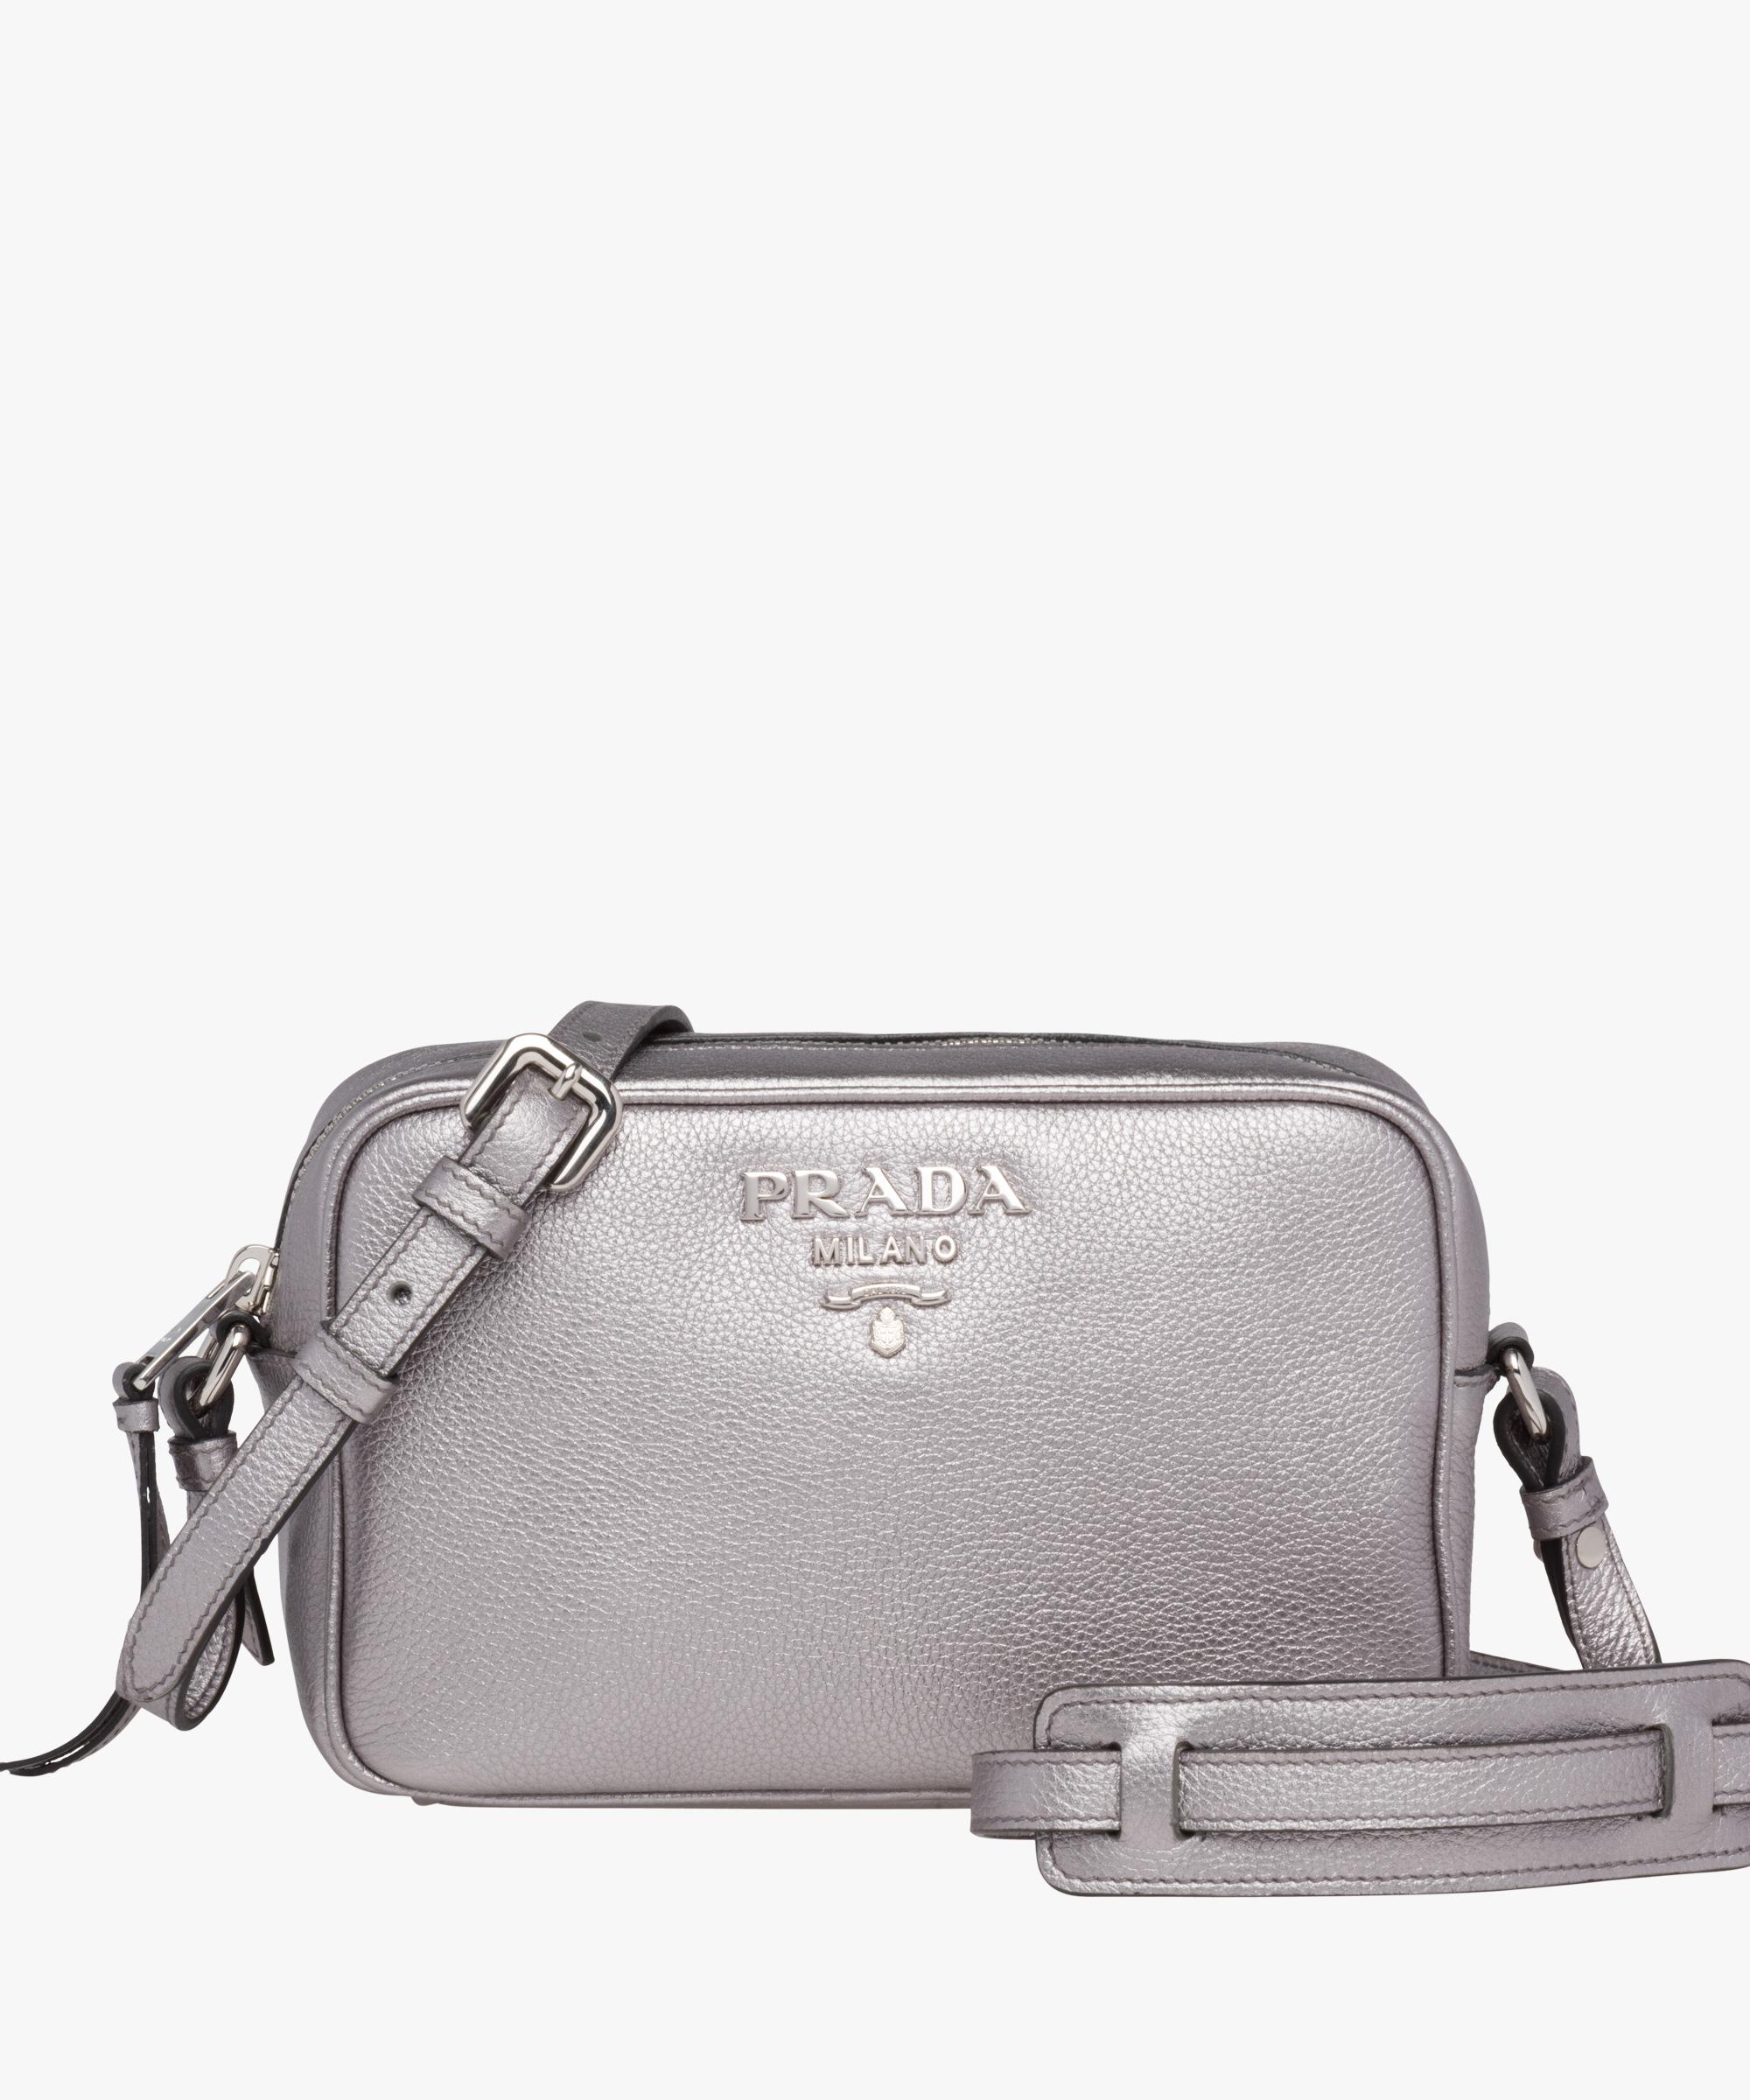 09feafe98b2c ... new style leather shoulder bag prada chrome leather shoulder bag prada  chrome 374e4 ceca5